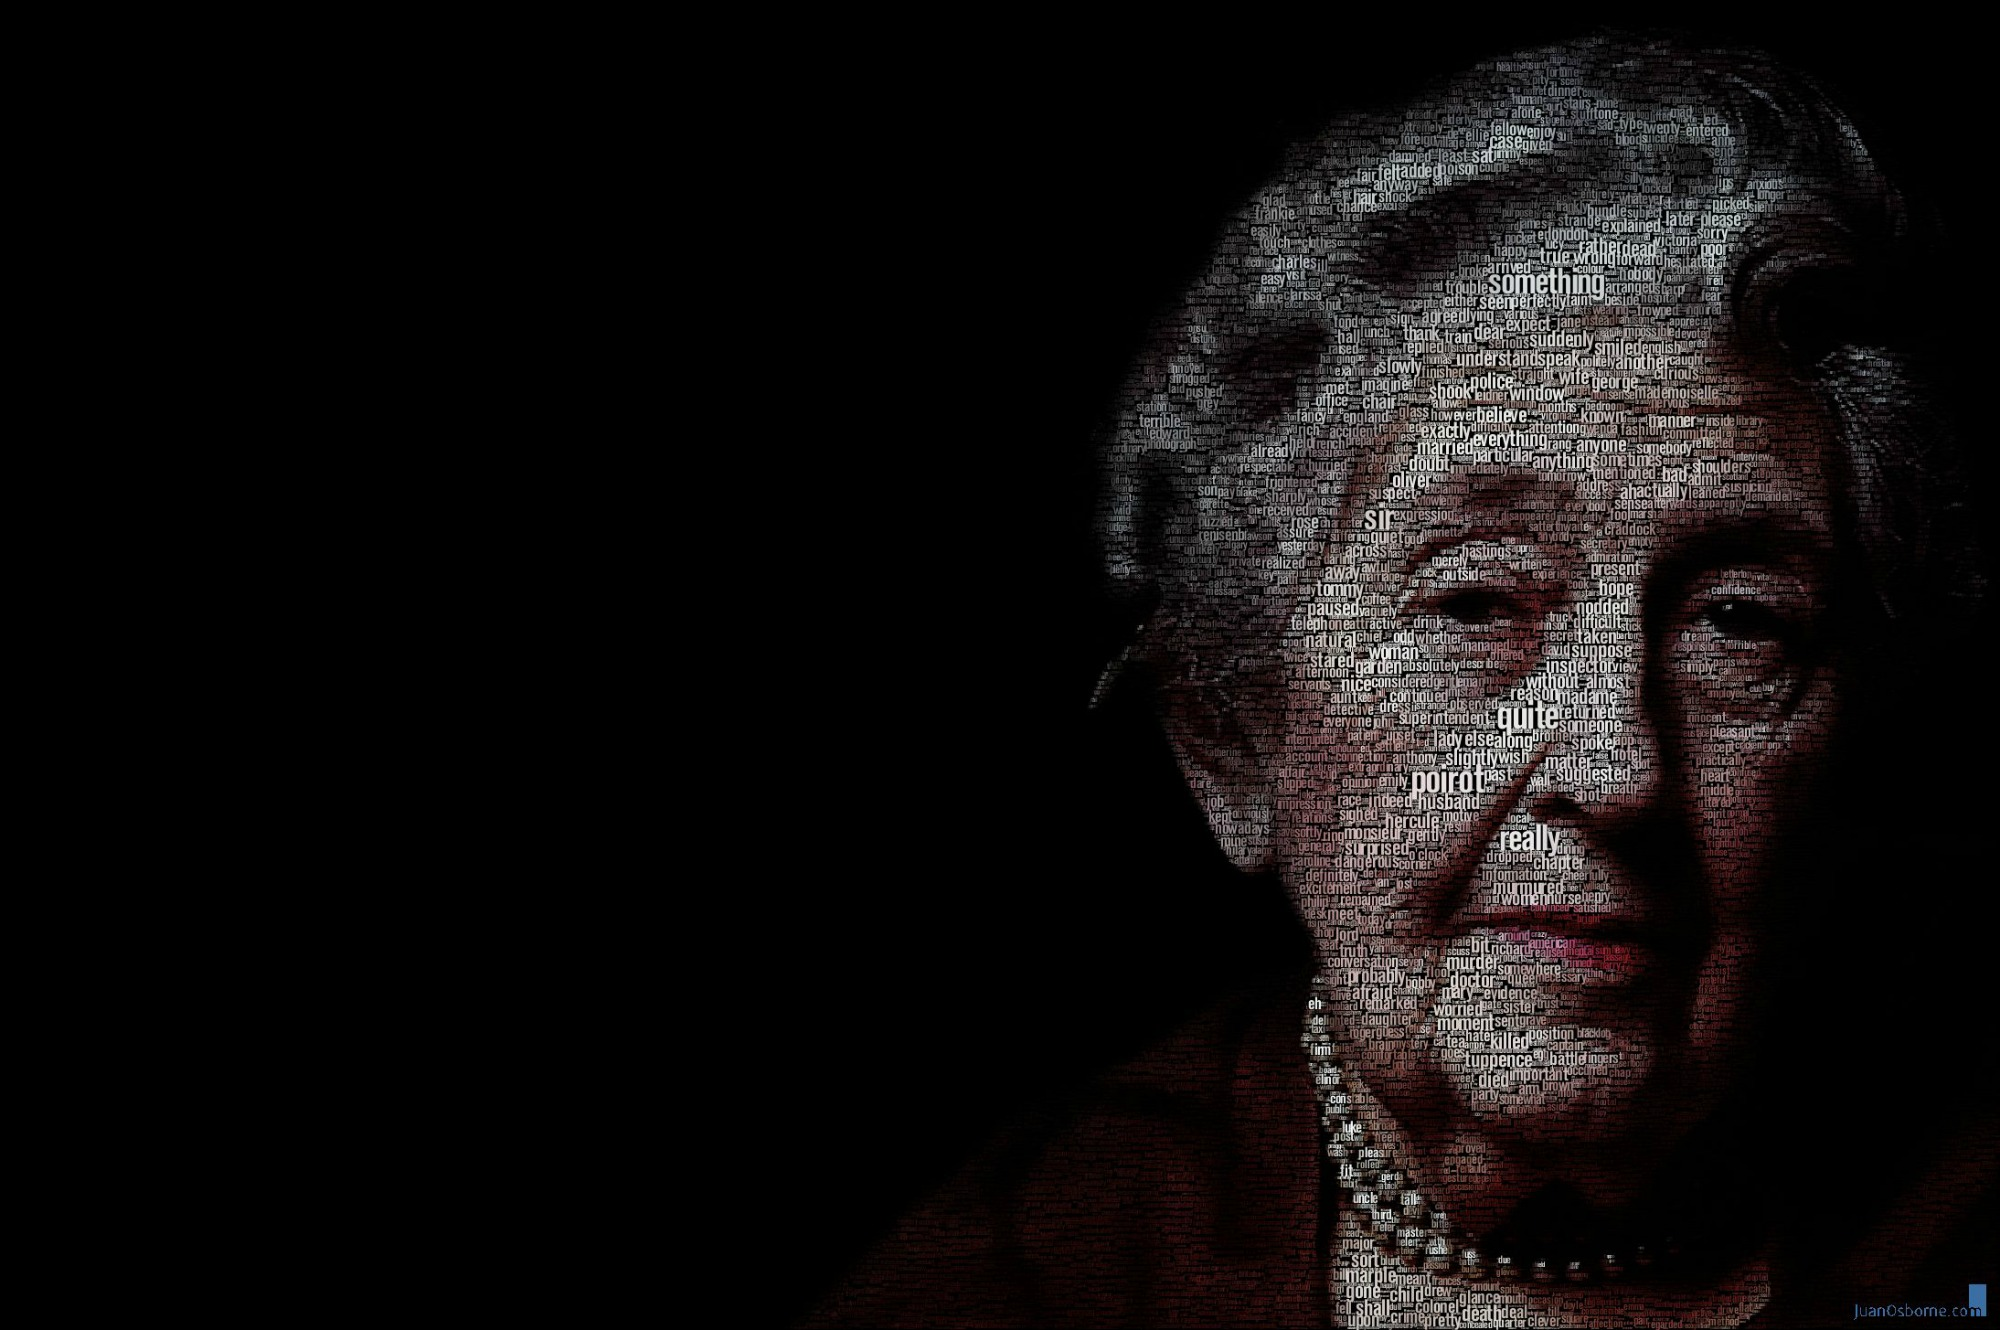 Retrato tipográfico de Agatha Christie realizado por Juan Osborne